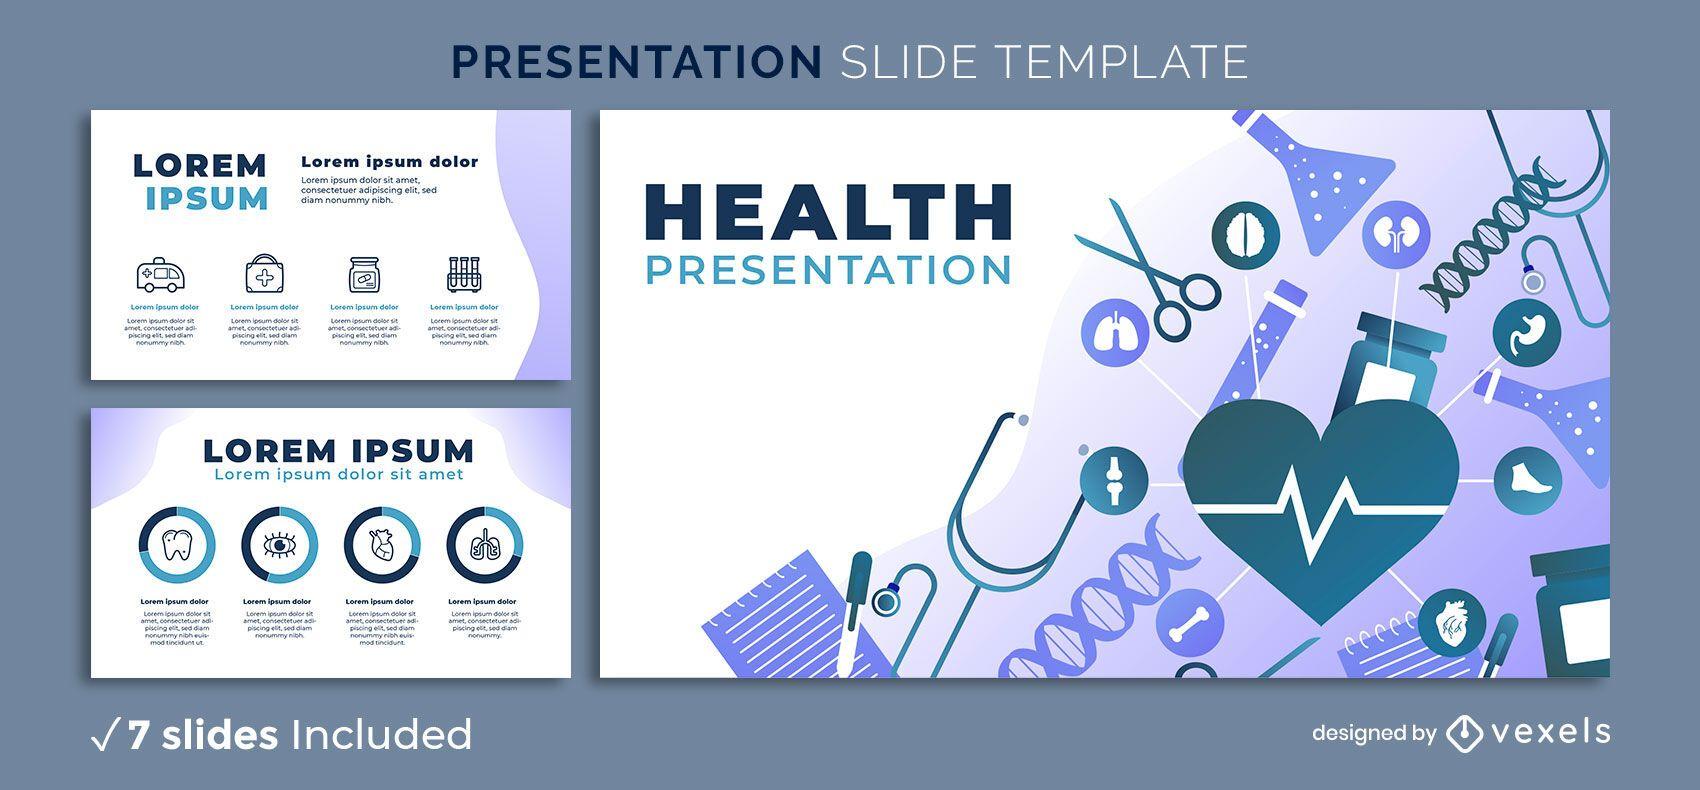 Health Presentation Template